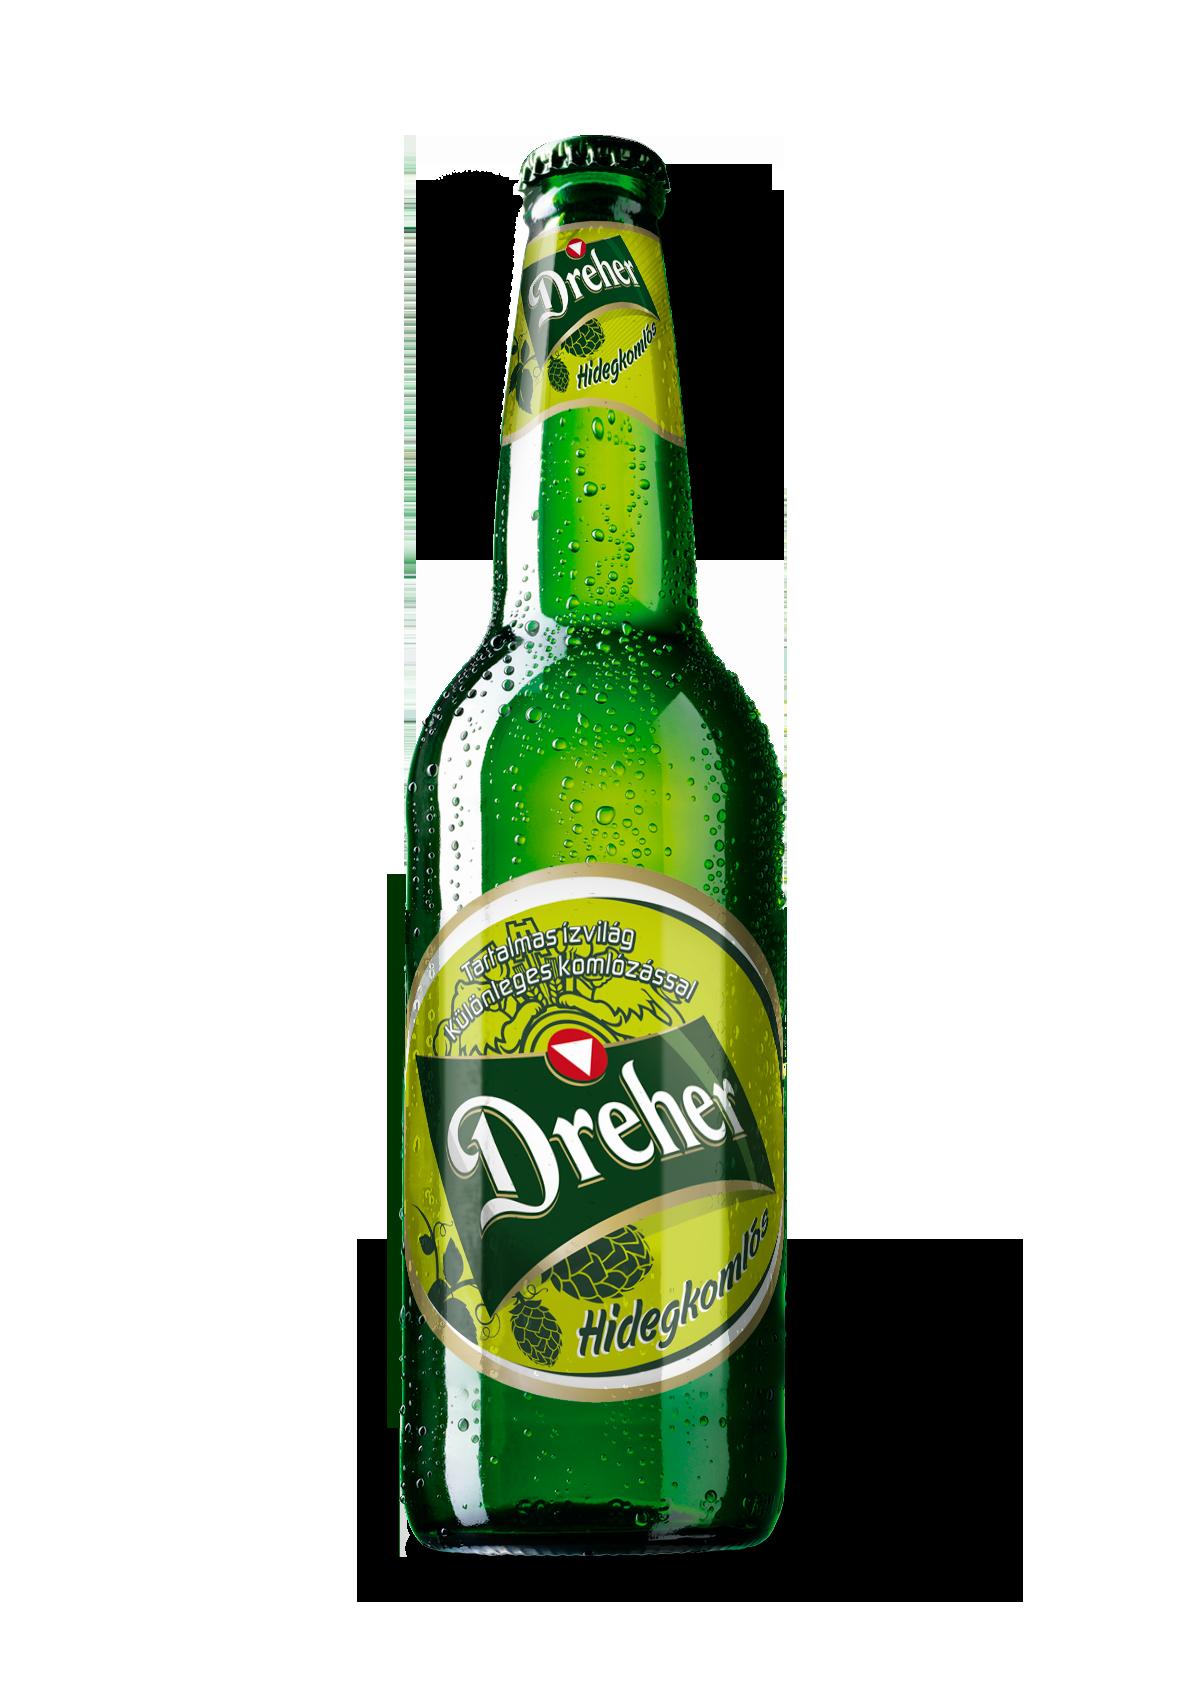 dreher_hidegkomlos_bottle_3d.png